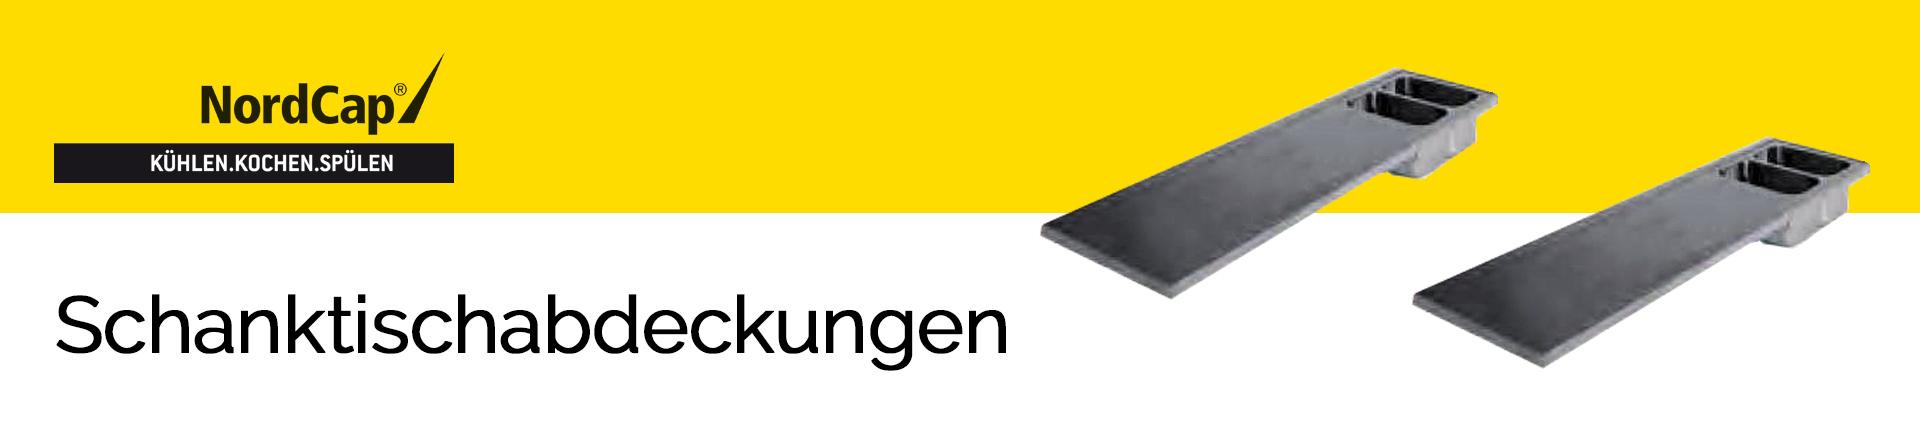 NordCap Schanktischabdeckungen Banner